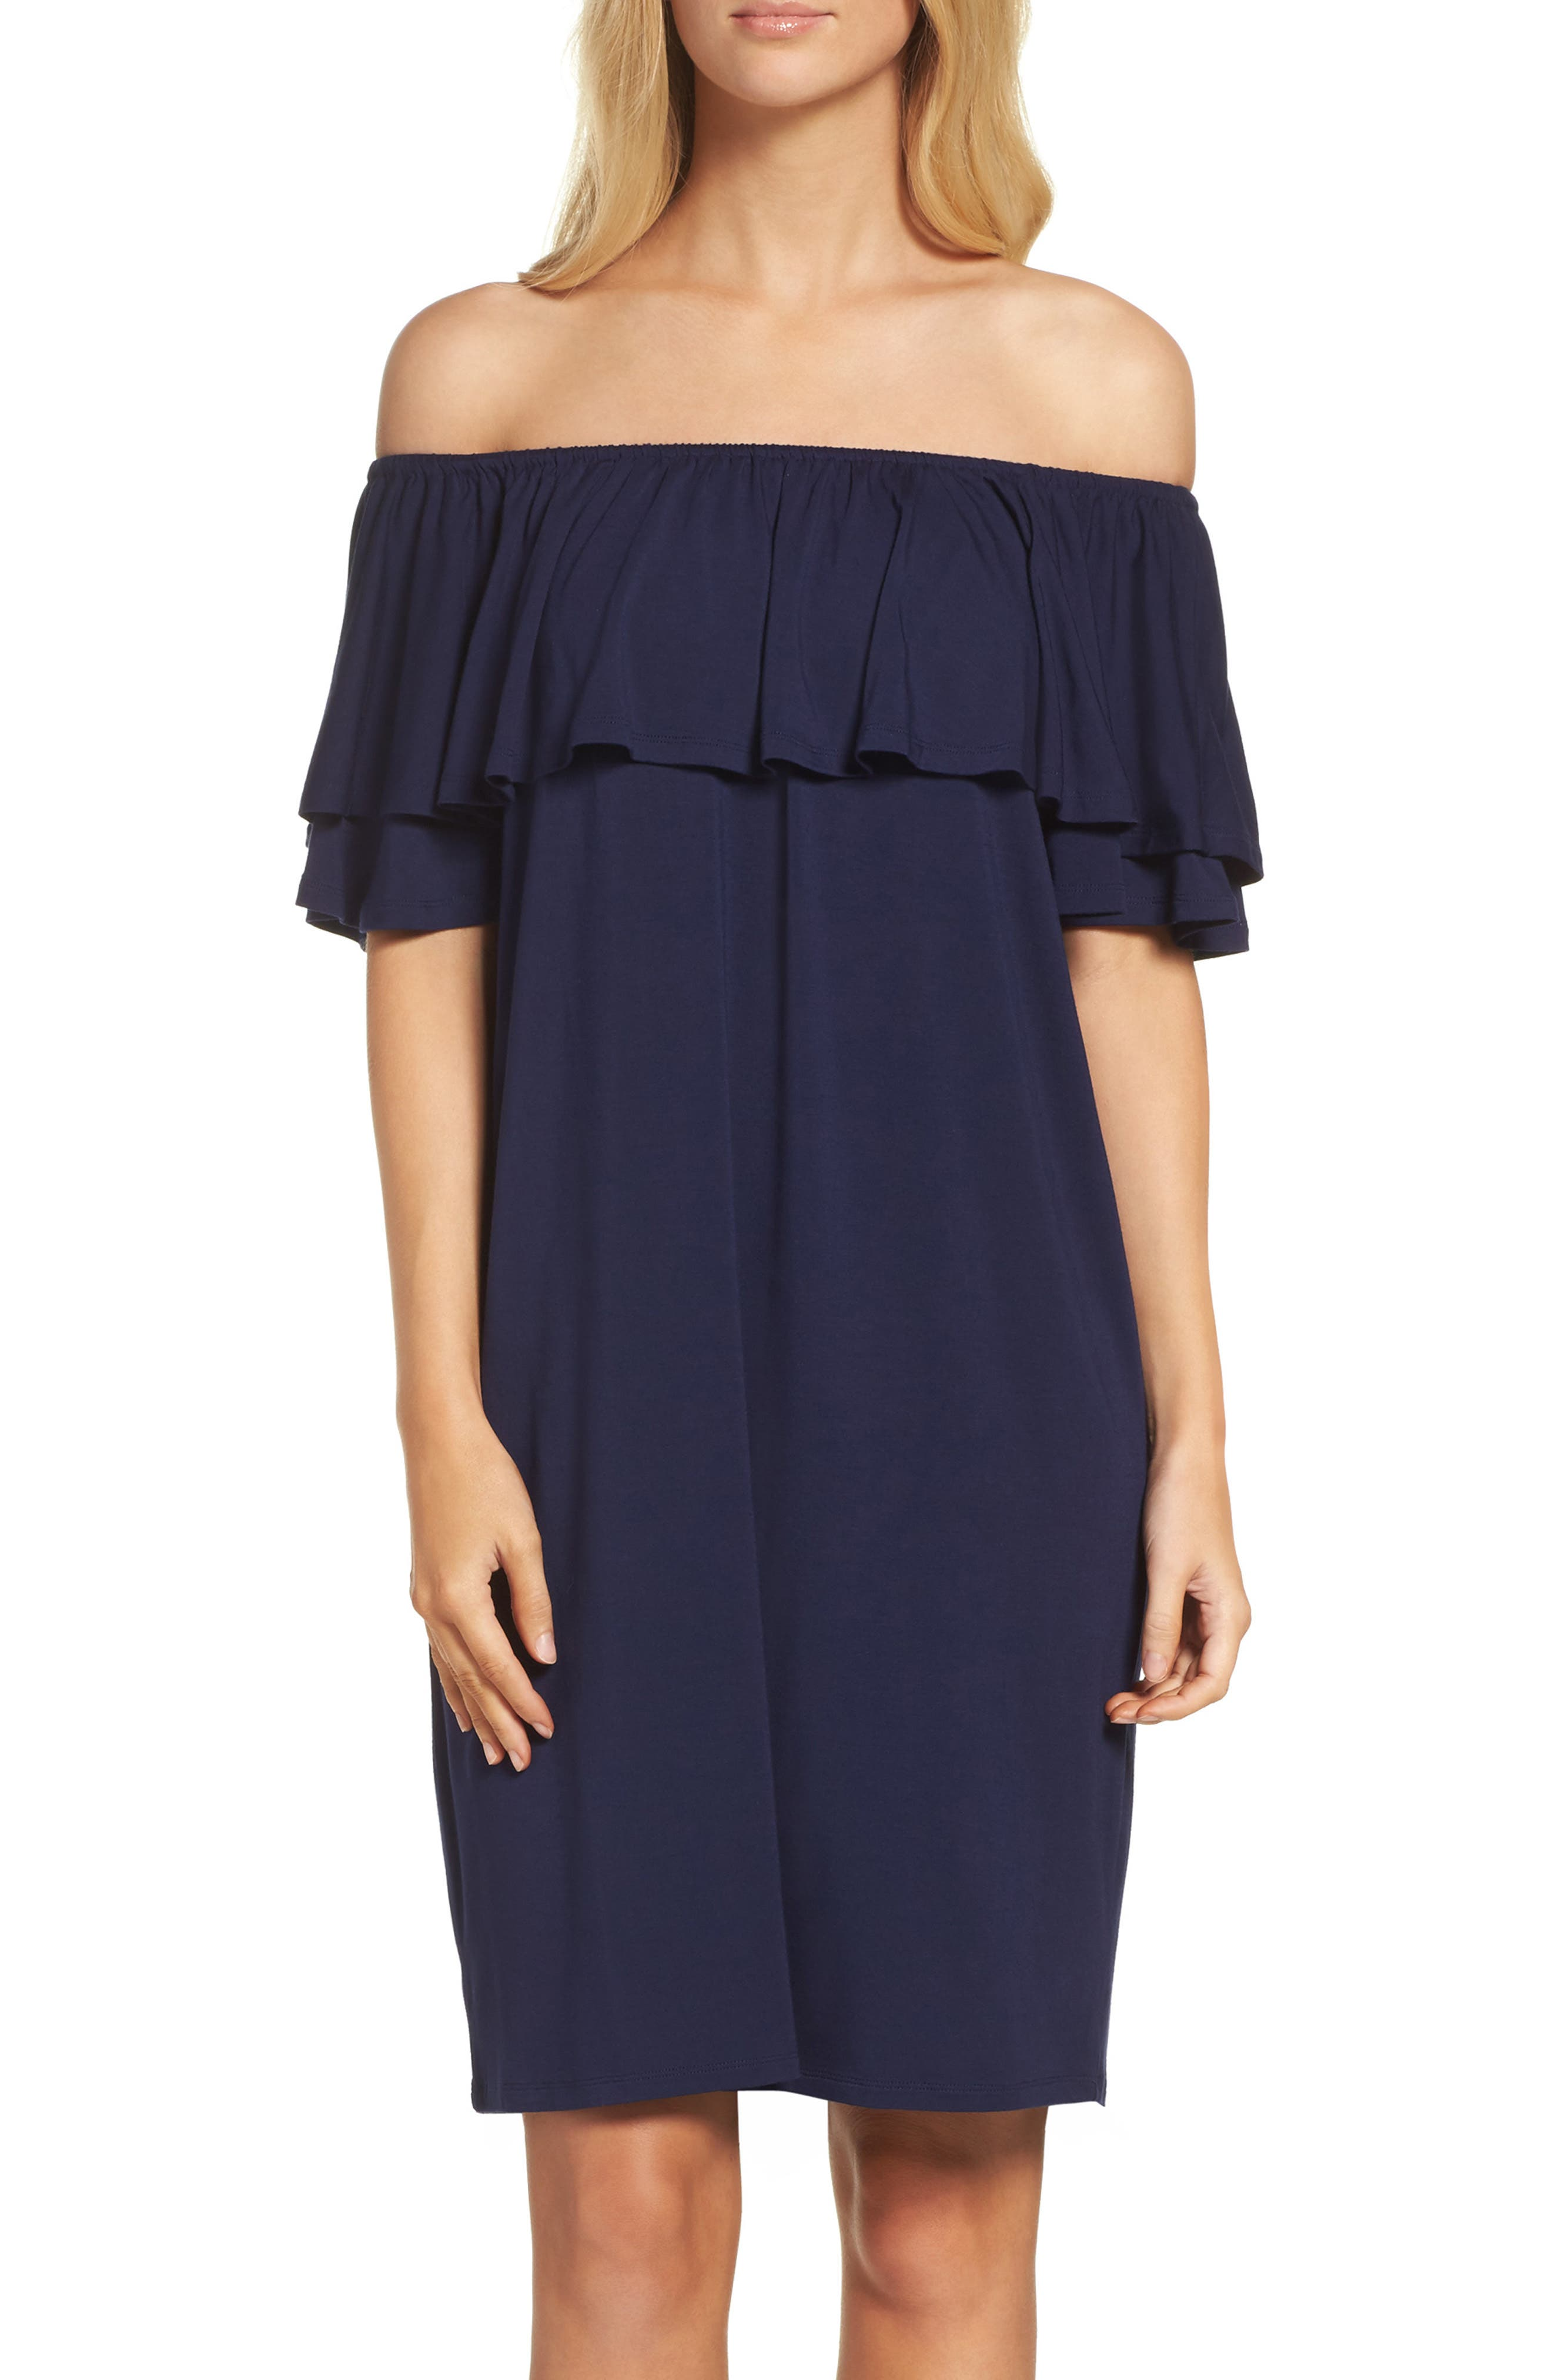 Felicity & Coco Off the Shoulder Dress (Regular & Petite) (Nordstrom Exclusive)